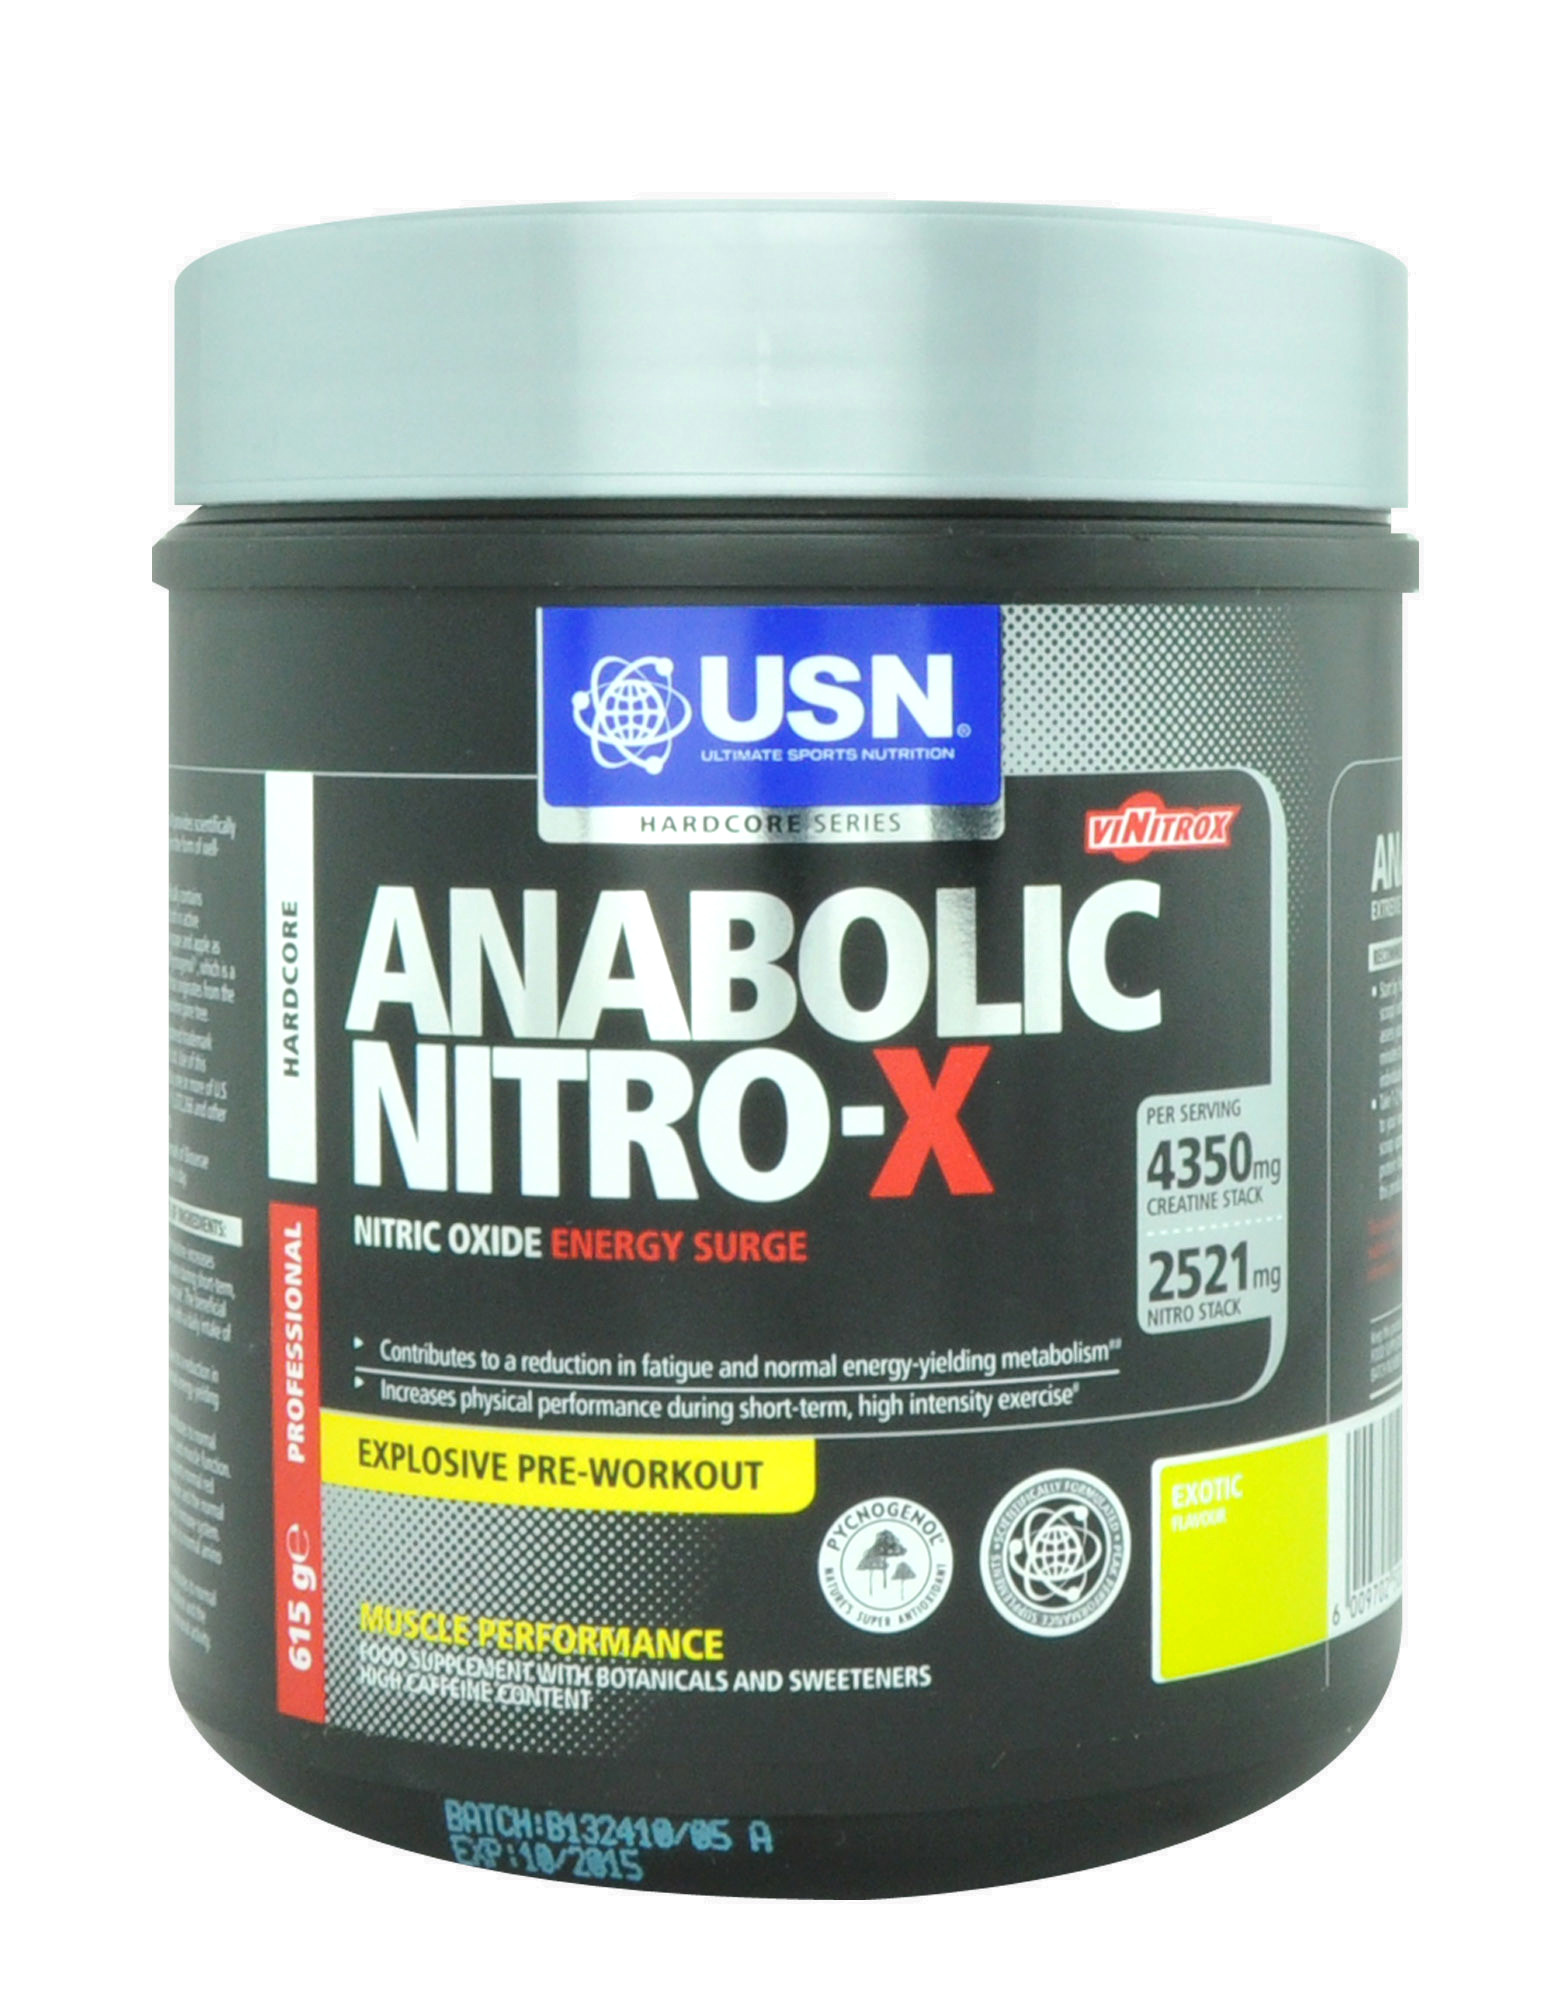 usn anabolic nitro x erfahrung